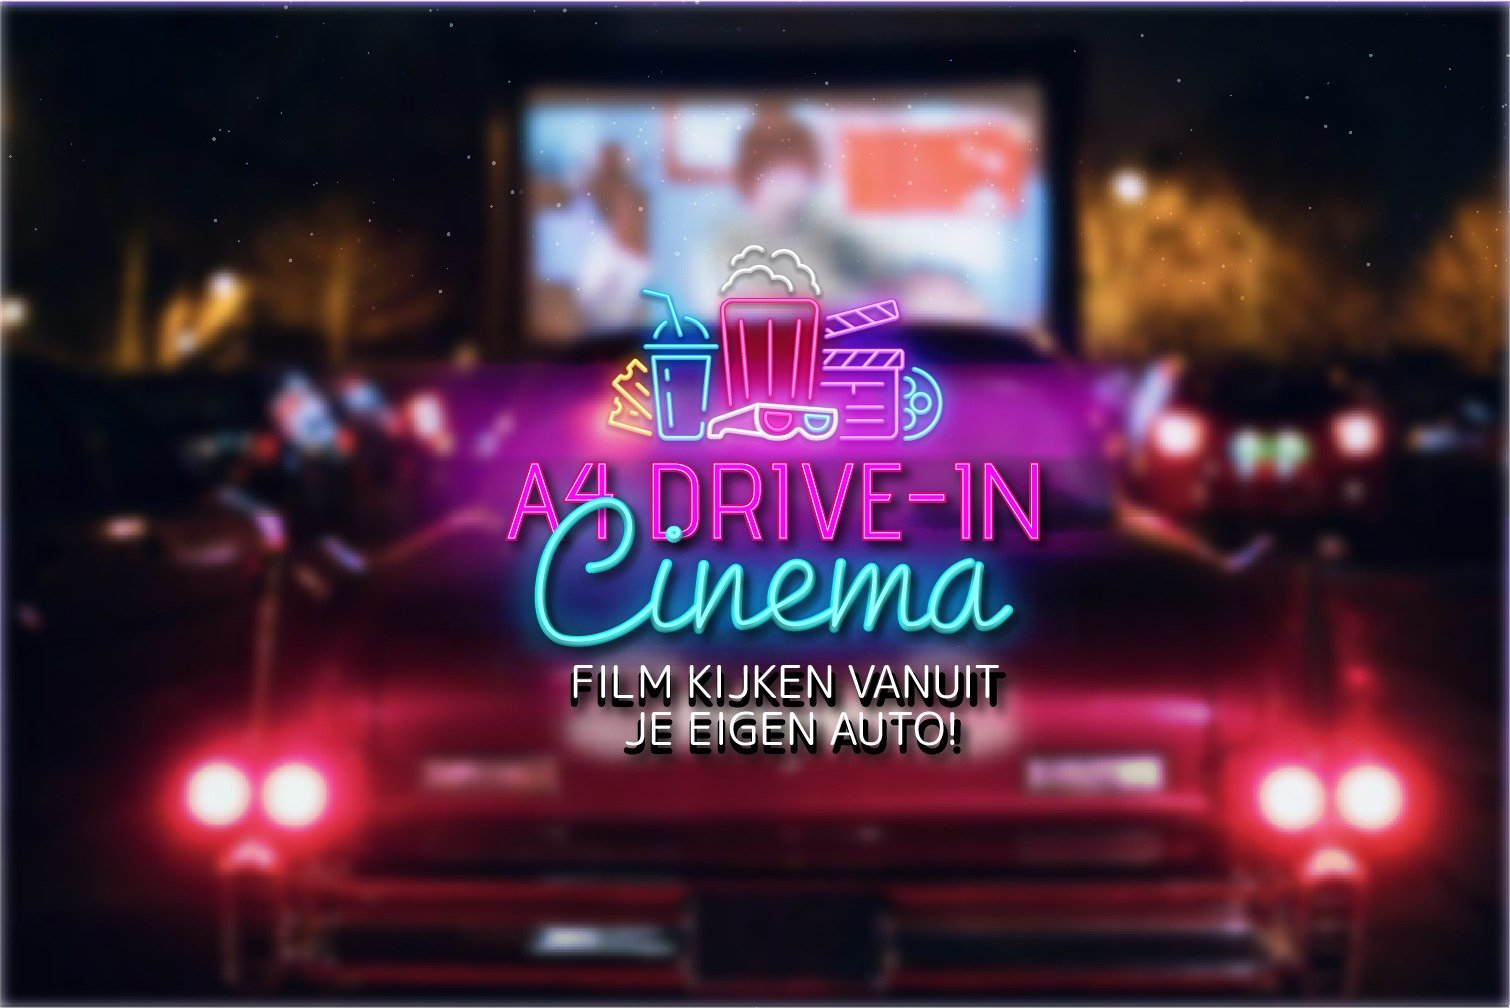 Drive-in bioscoop: Countdown